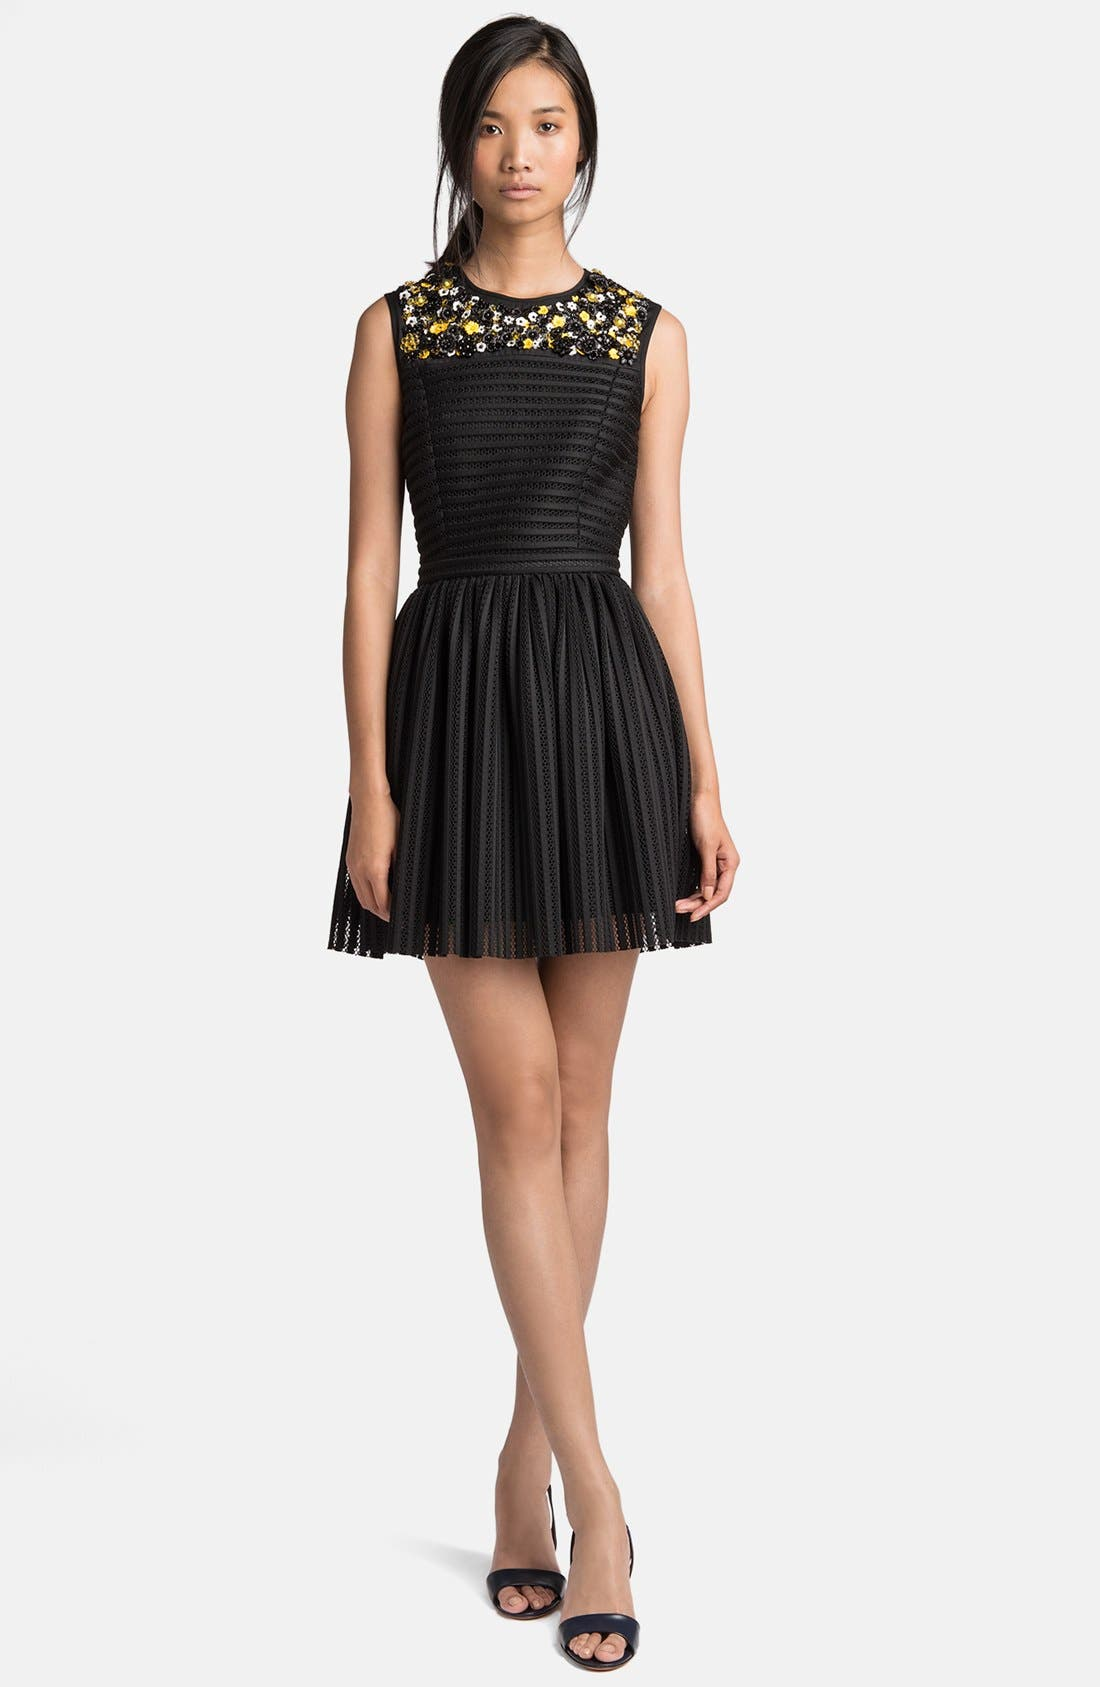 Main Image - MSGM Beaded Yoke Full Skirt Dress